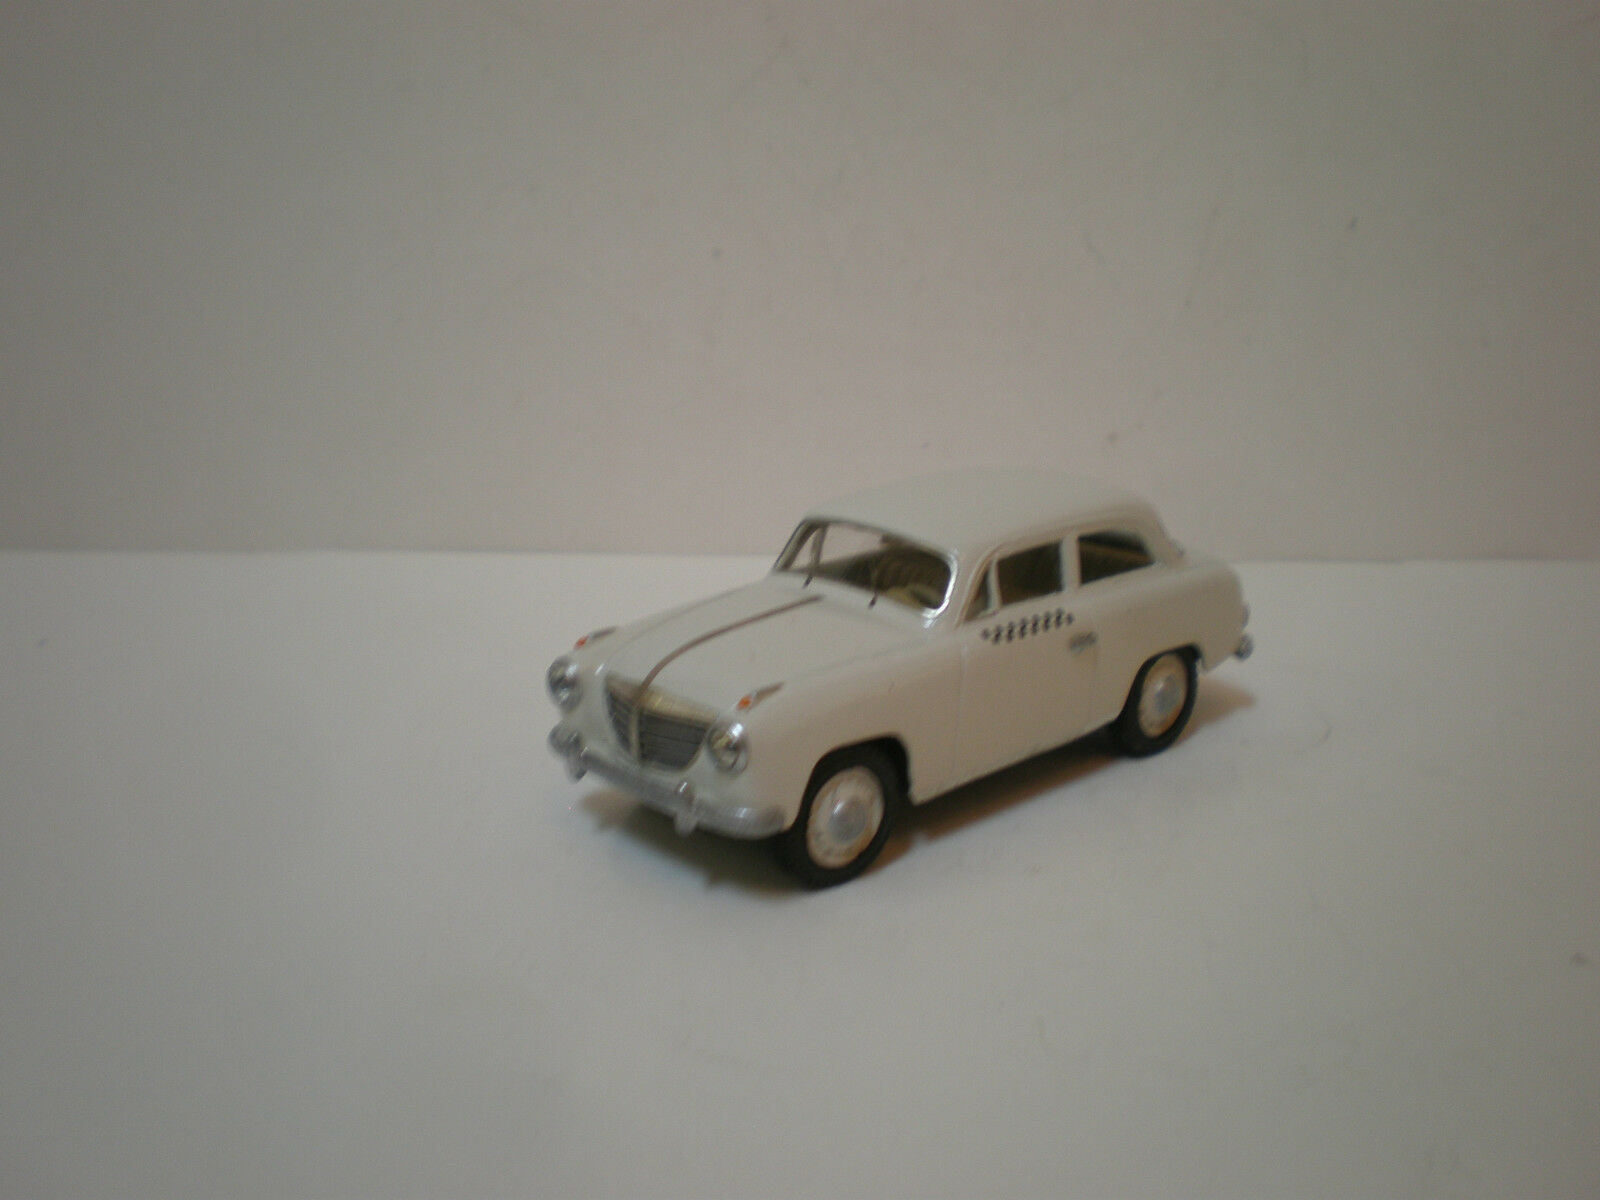 1 43 GERMAN CAR GOLIATH GP 700 COUPE TAXI 1953